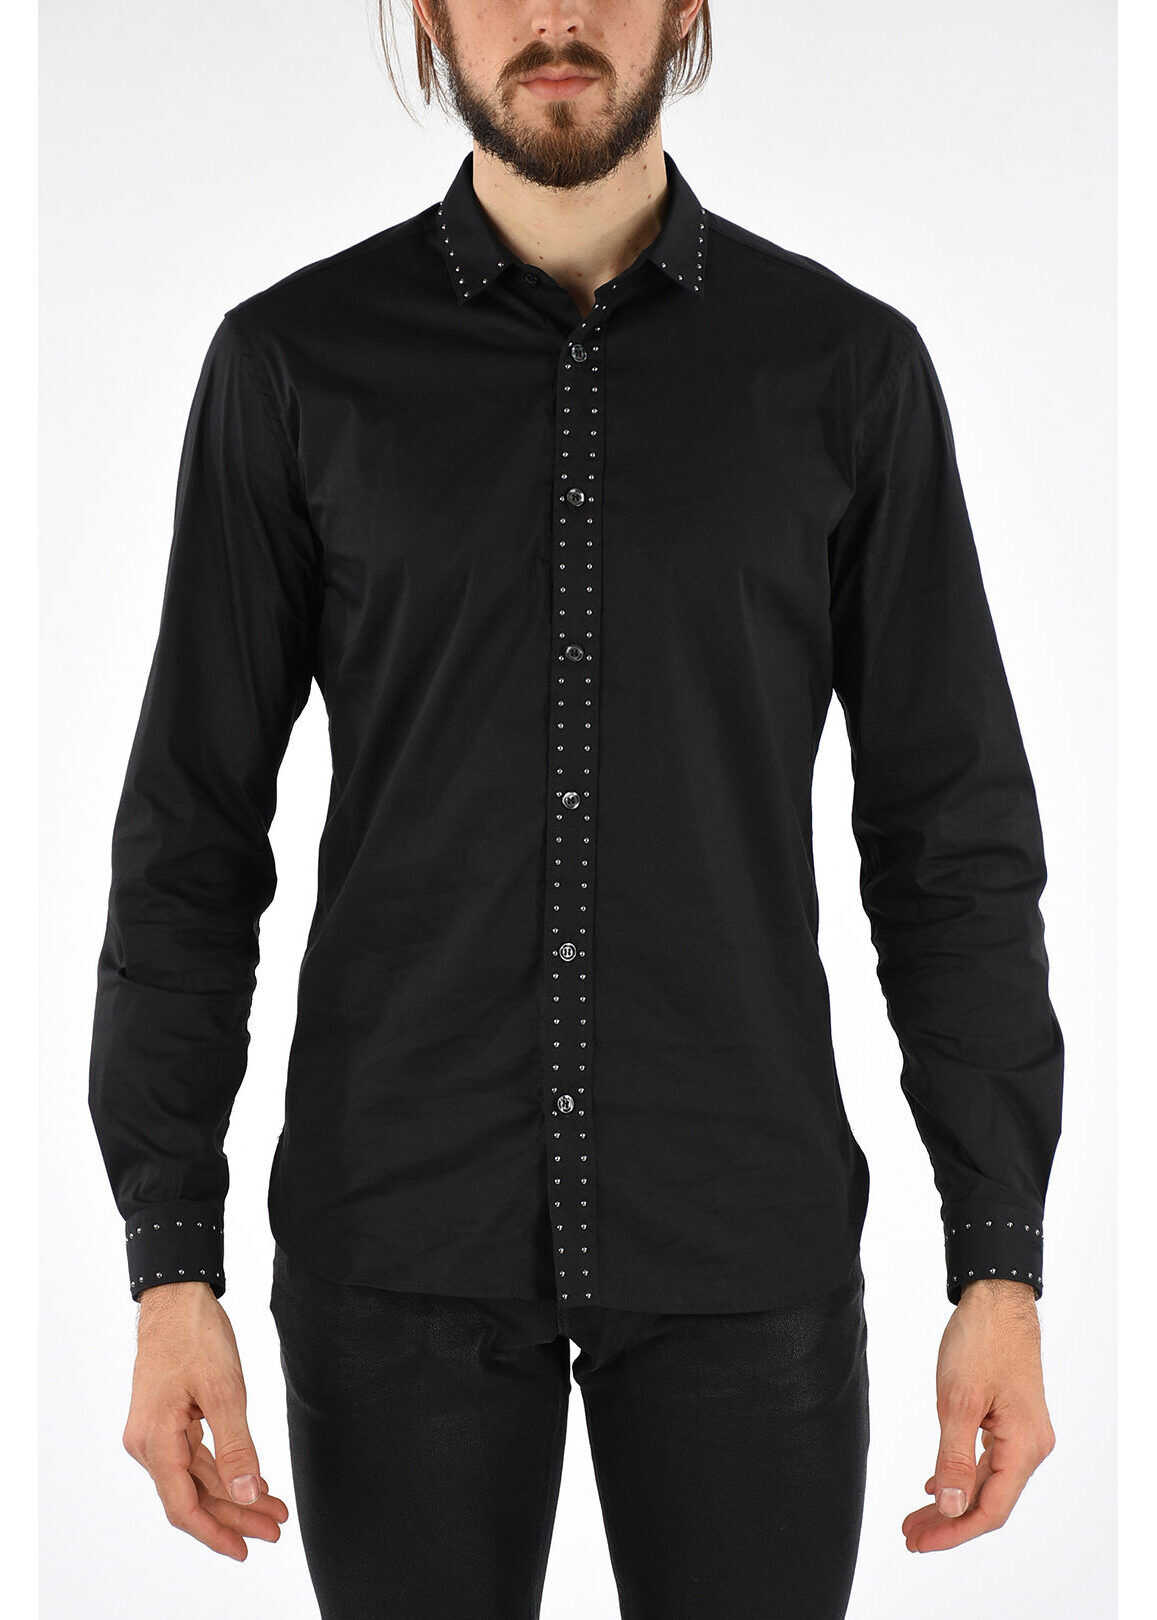 Just Cavalli Studded Shirt BLACK